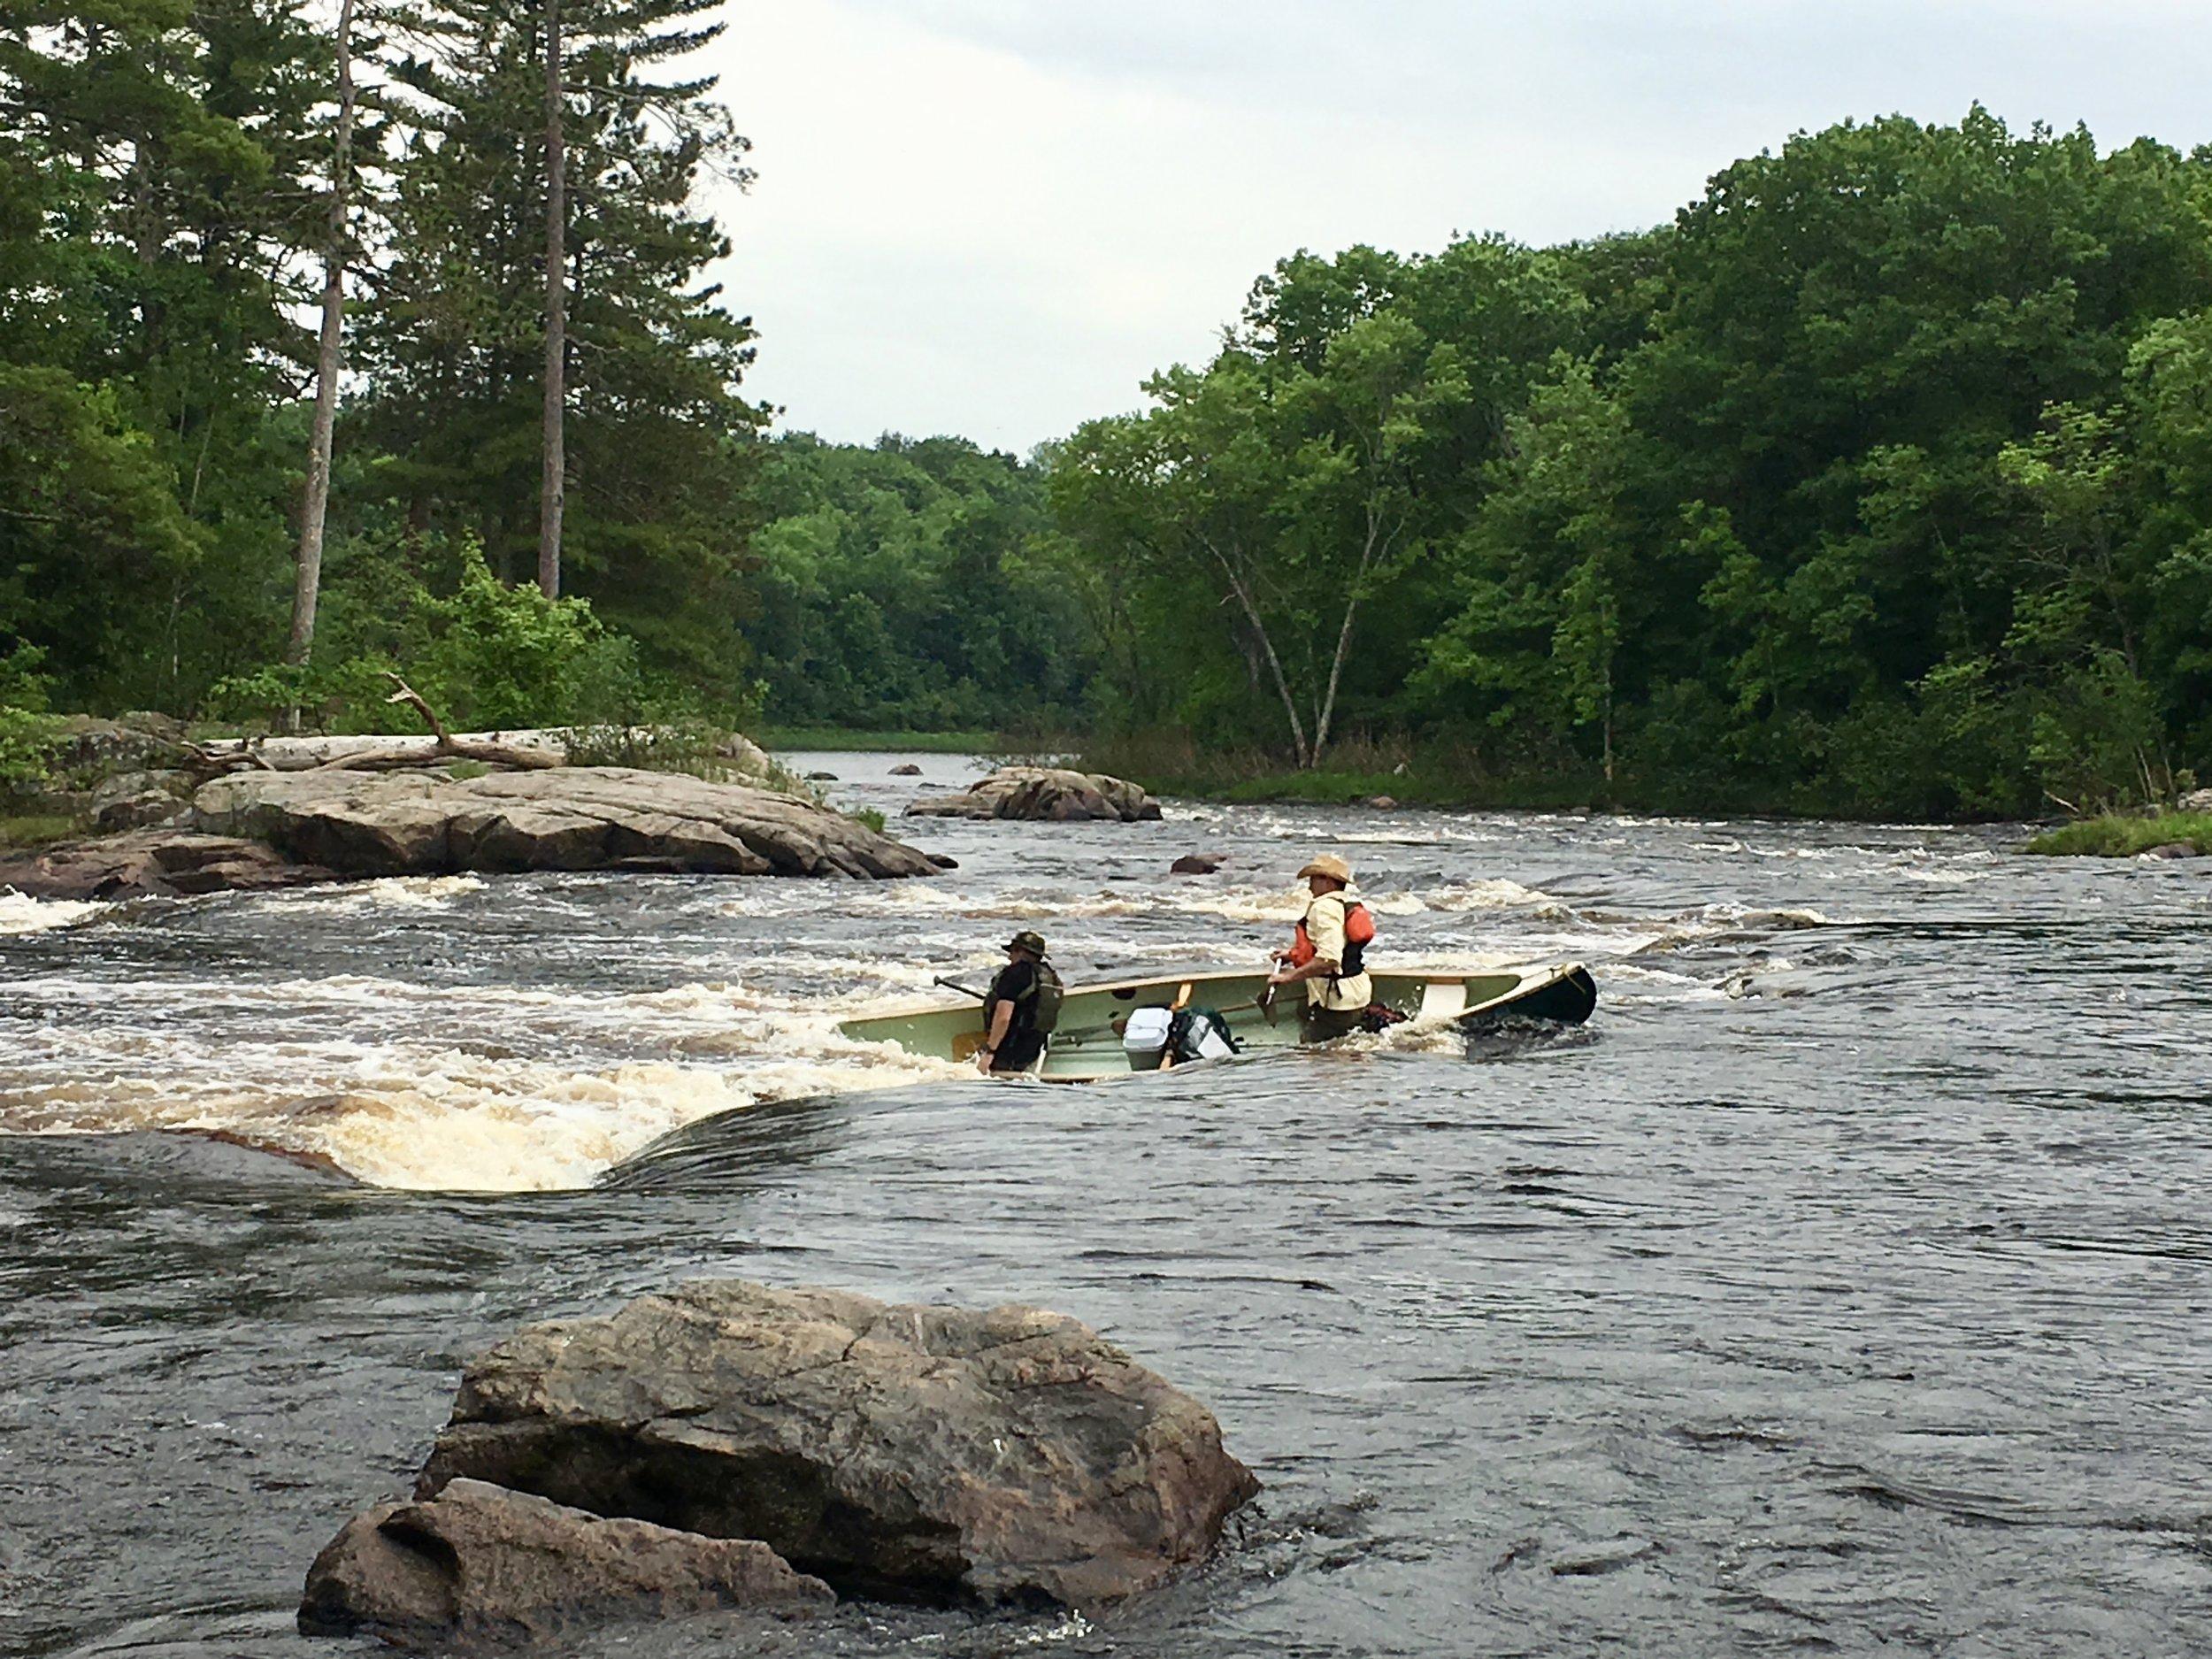 Paddling the Flambeau River (WI)